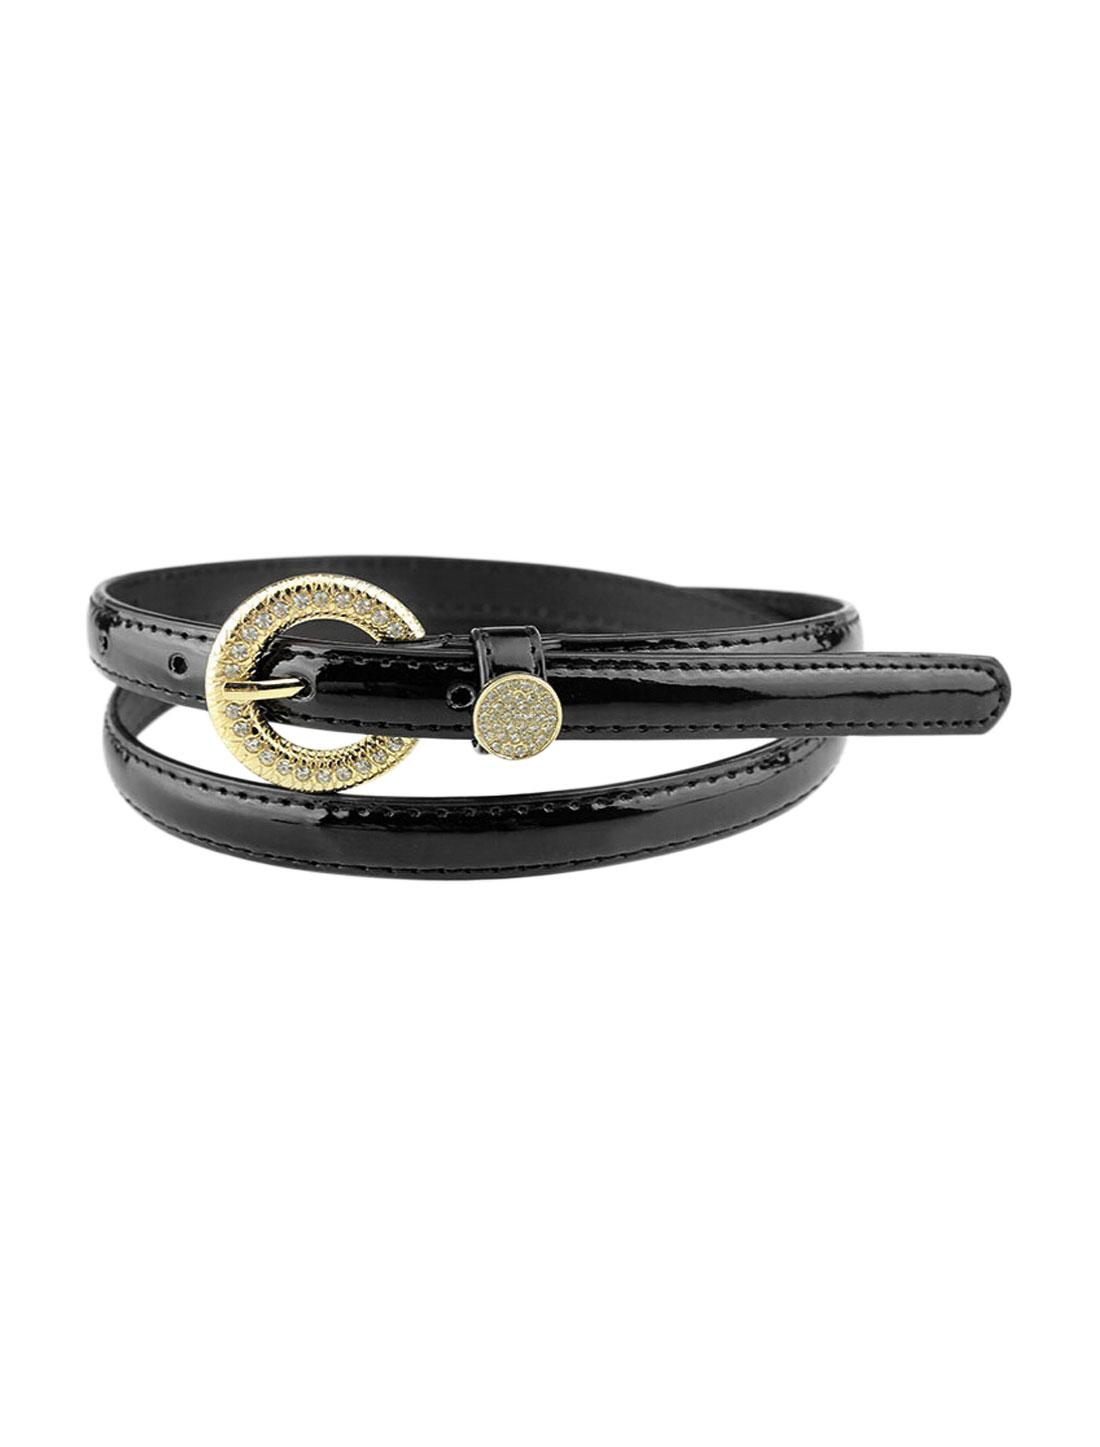 Women Rhinestone Decor Single Pin Buckle Waist Belt Black